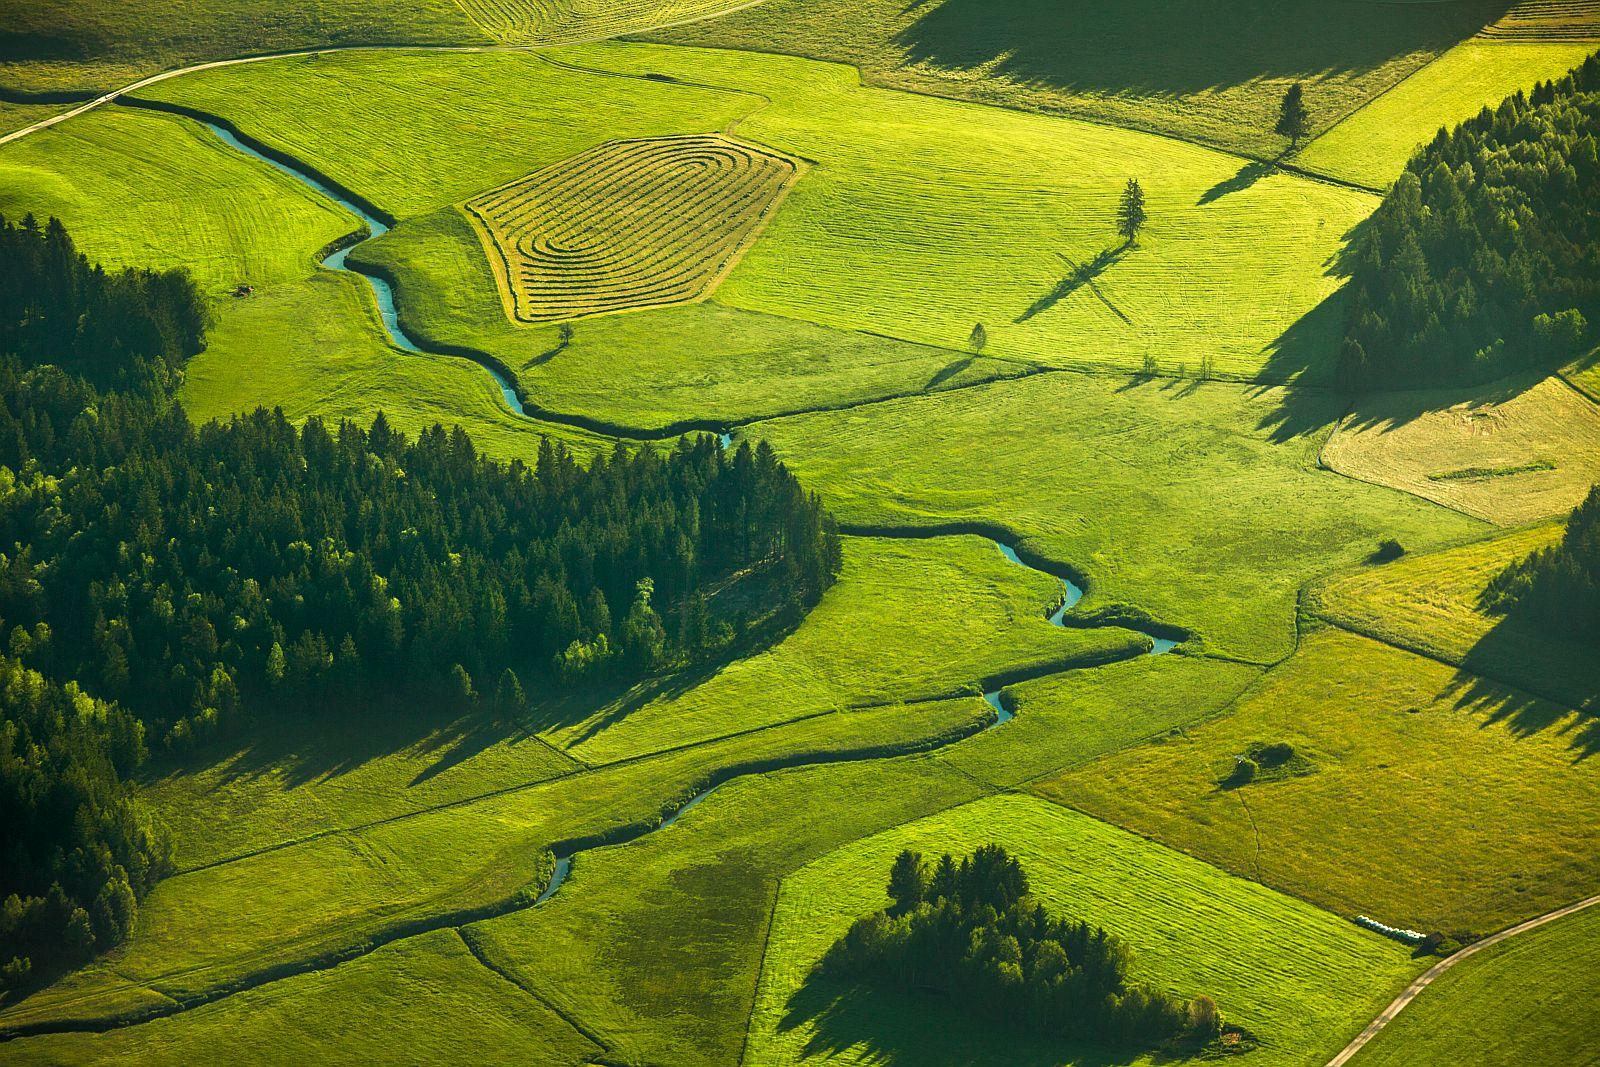 «Красота Баварии». Второе место в номинации «Съёмка природы с воздуха». Фото: Johannes Heuckeroth